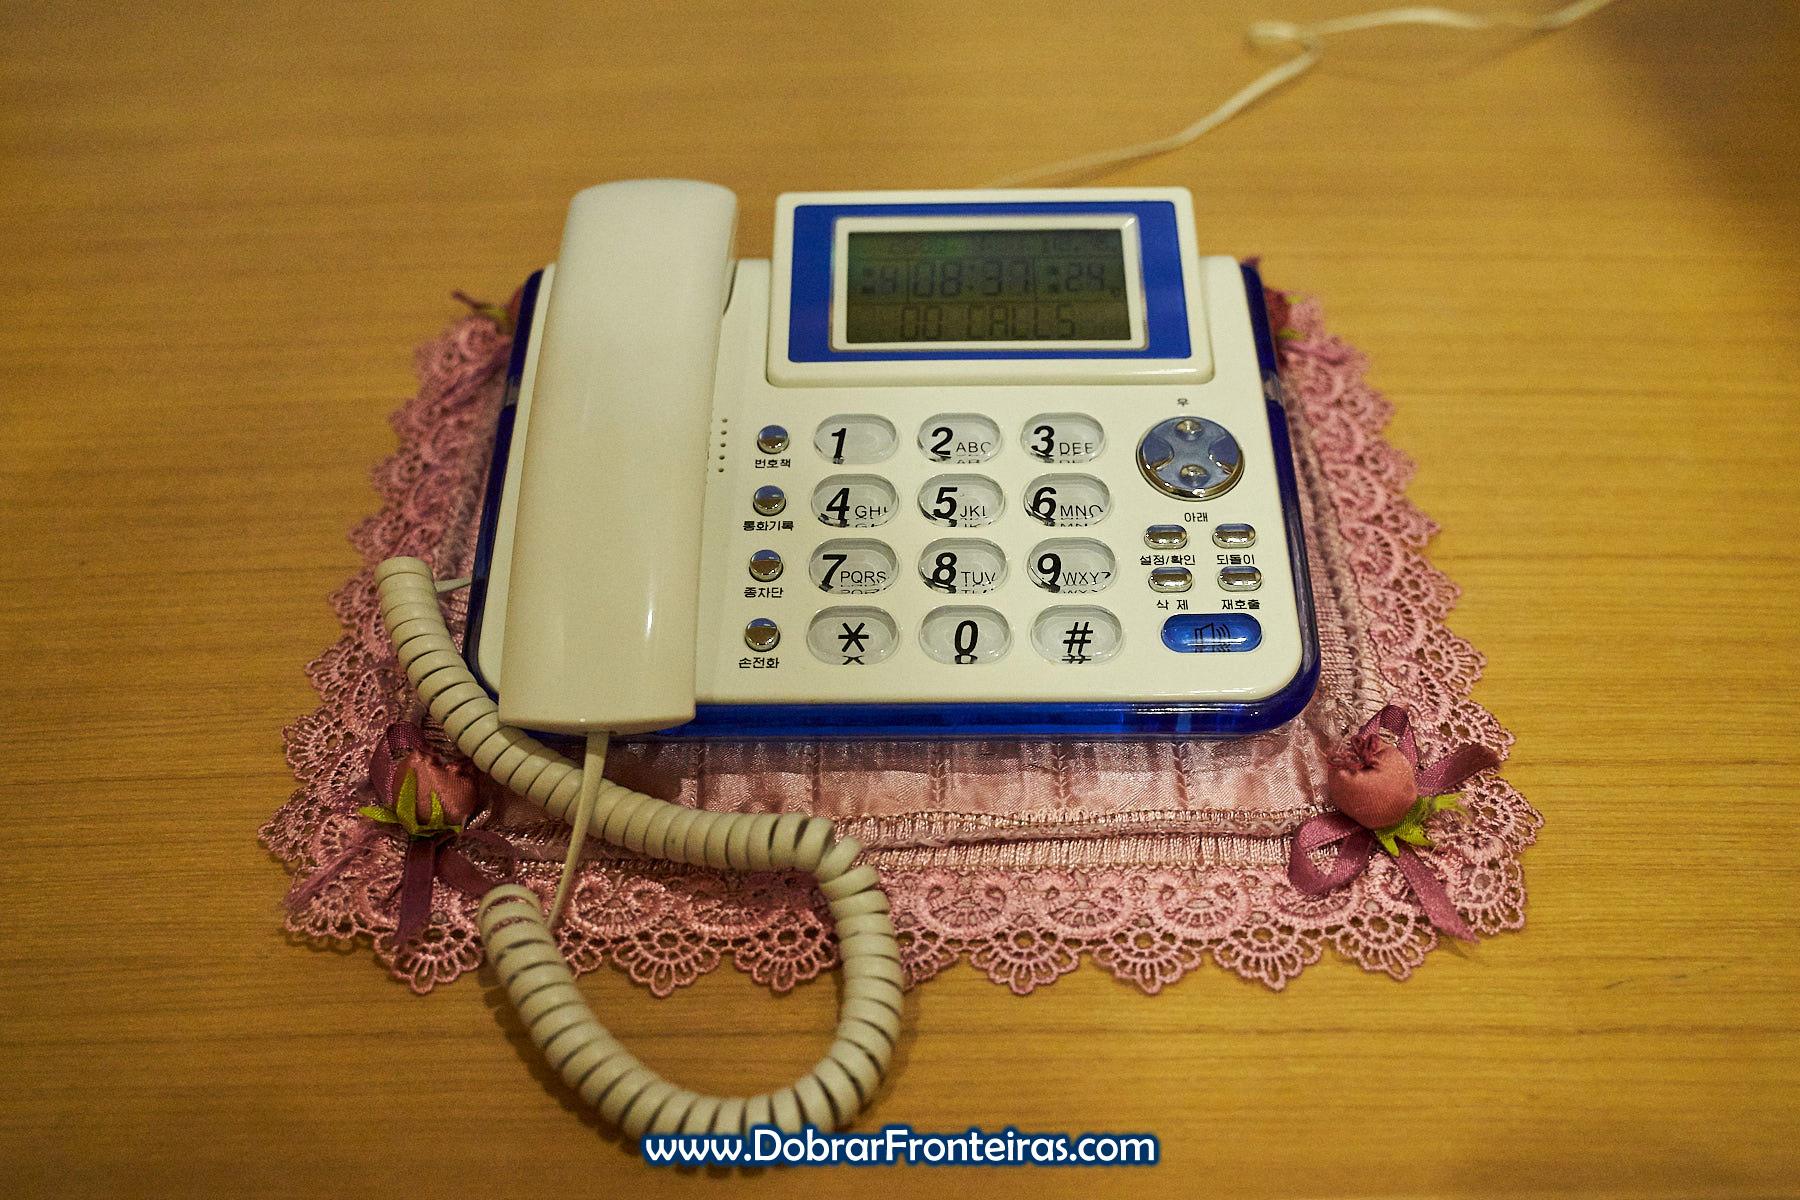 telefone sobre naperon no ohel Koyo em Pyongyang